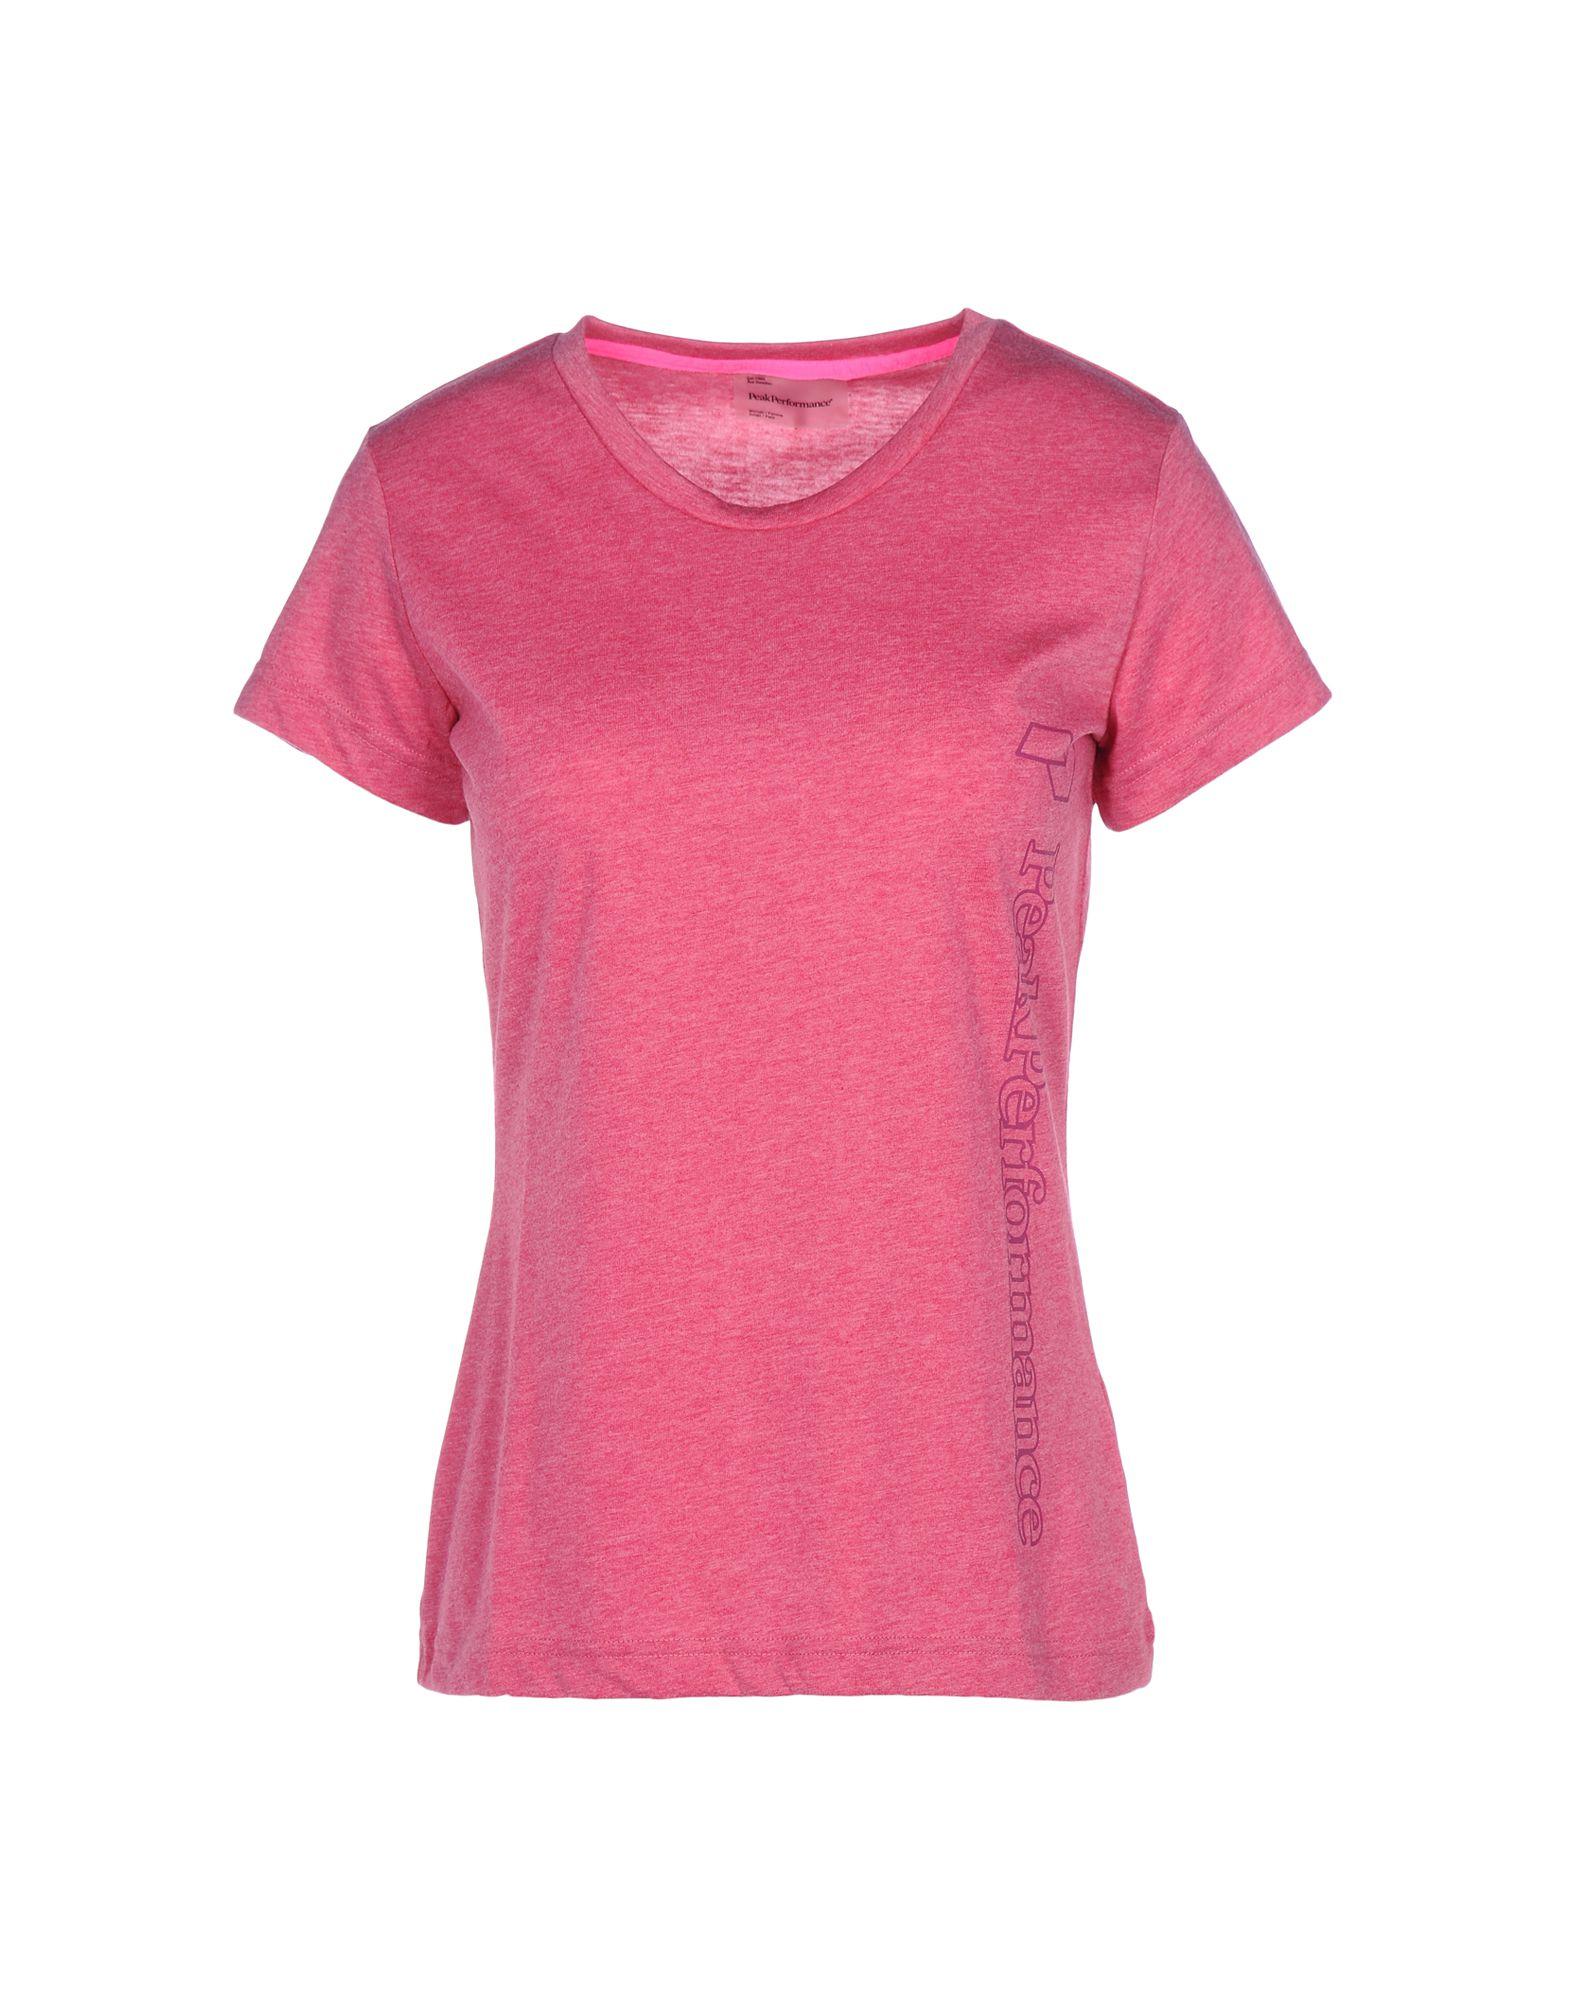 PEAK PERFORMANCE T-shirts